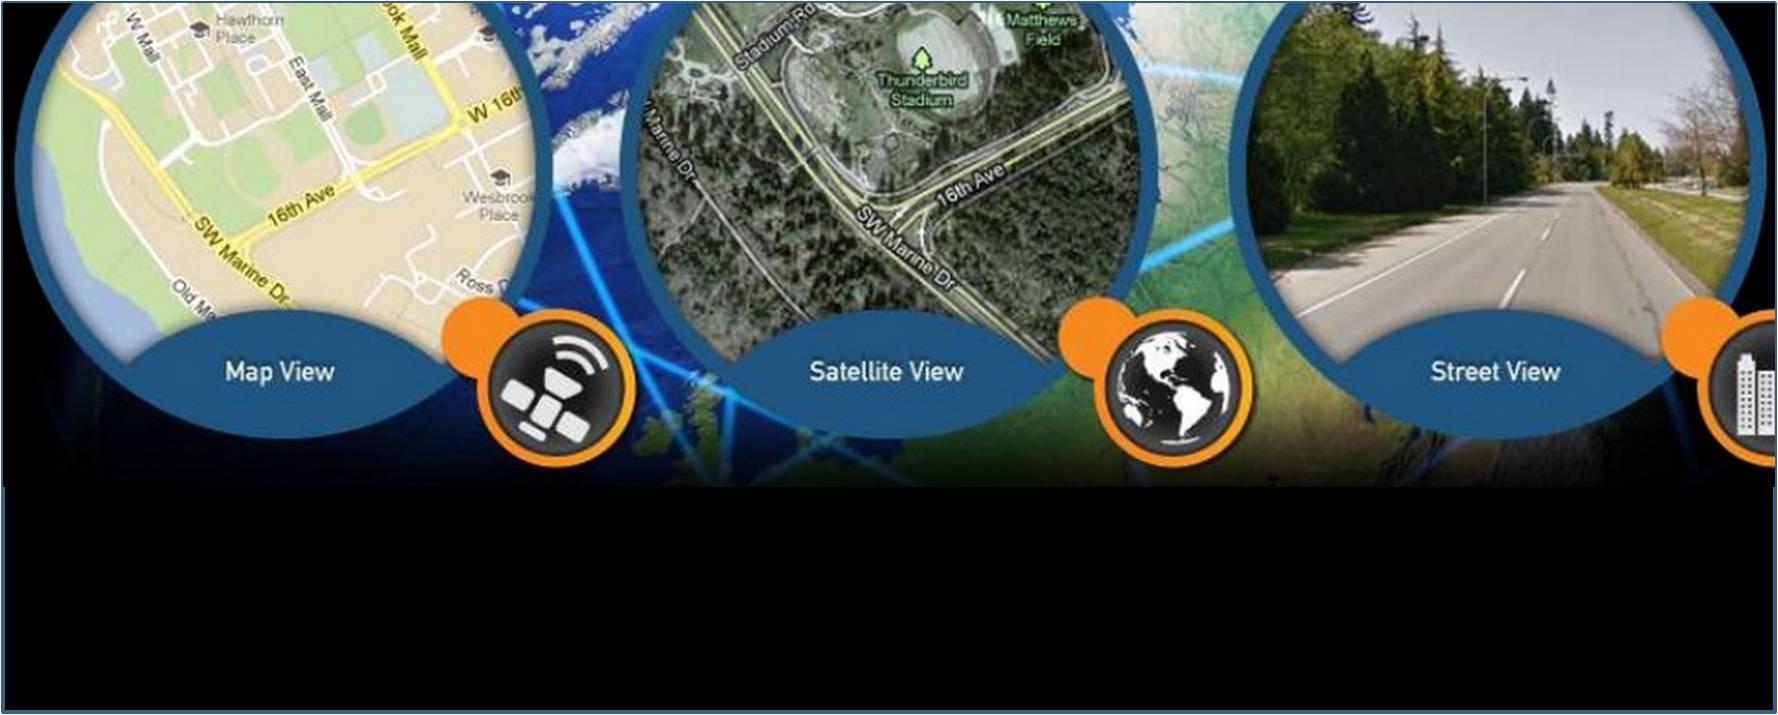 Simulating outdoor training conditions with satnav